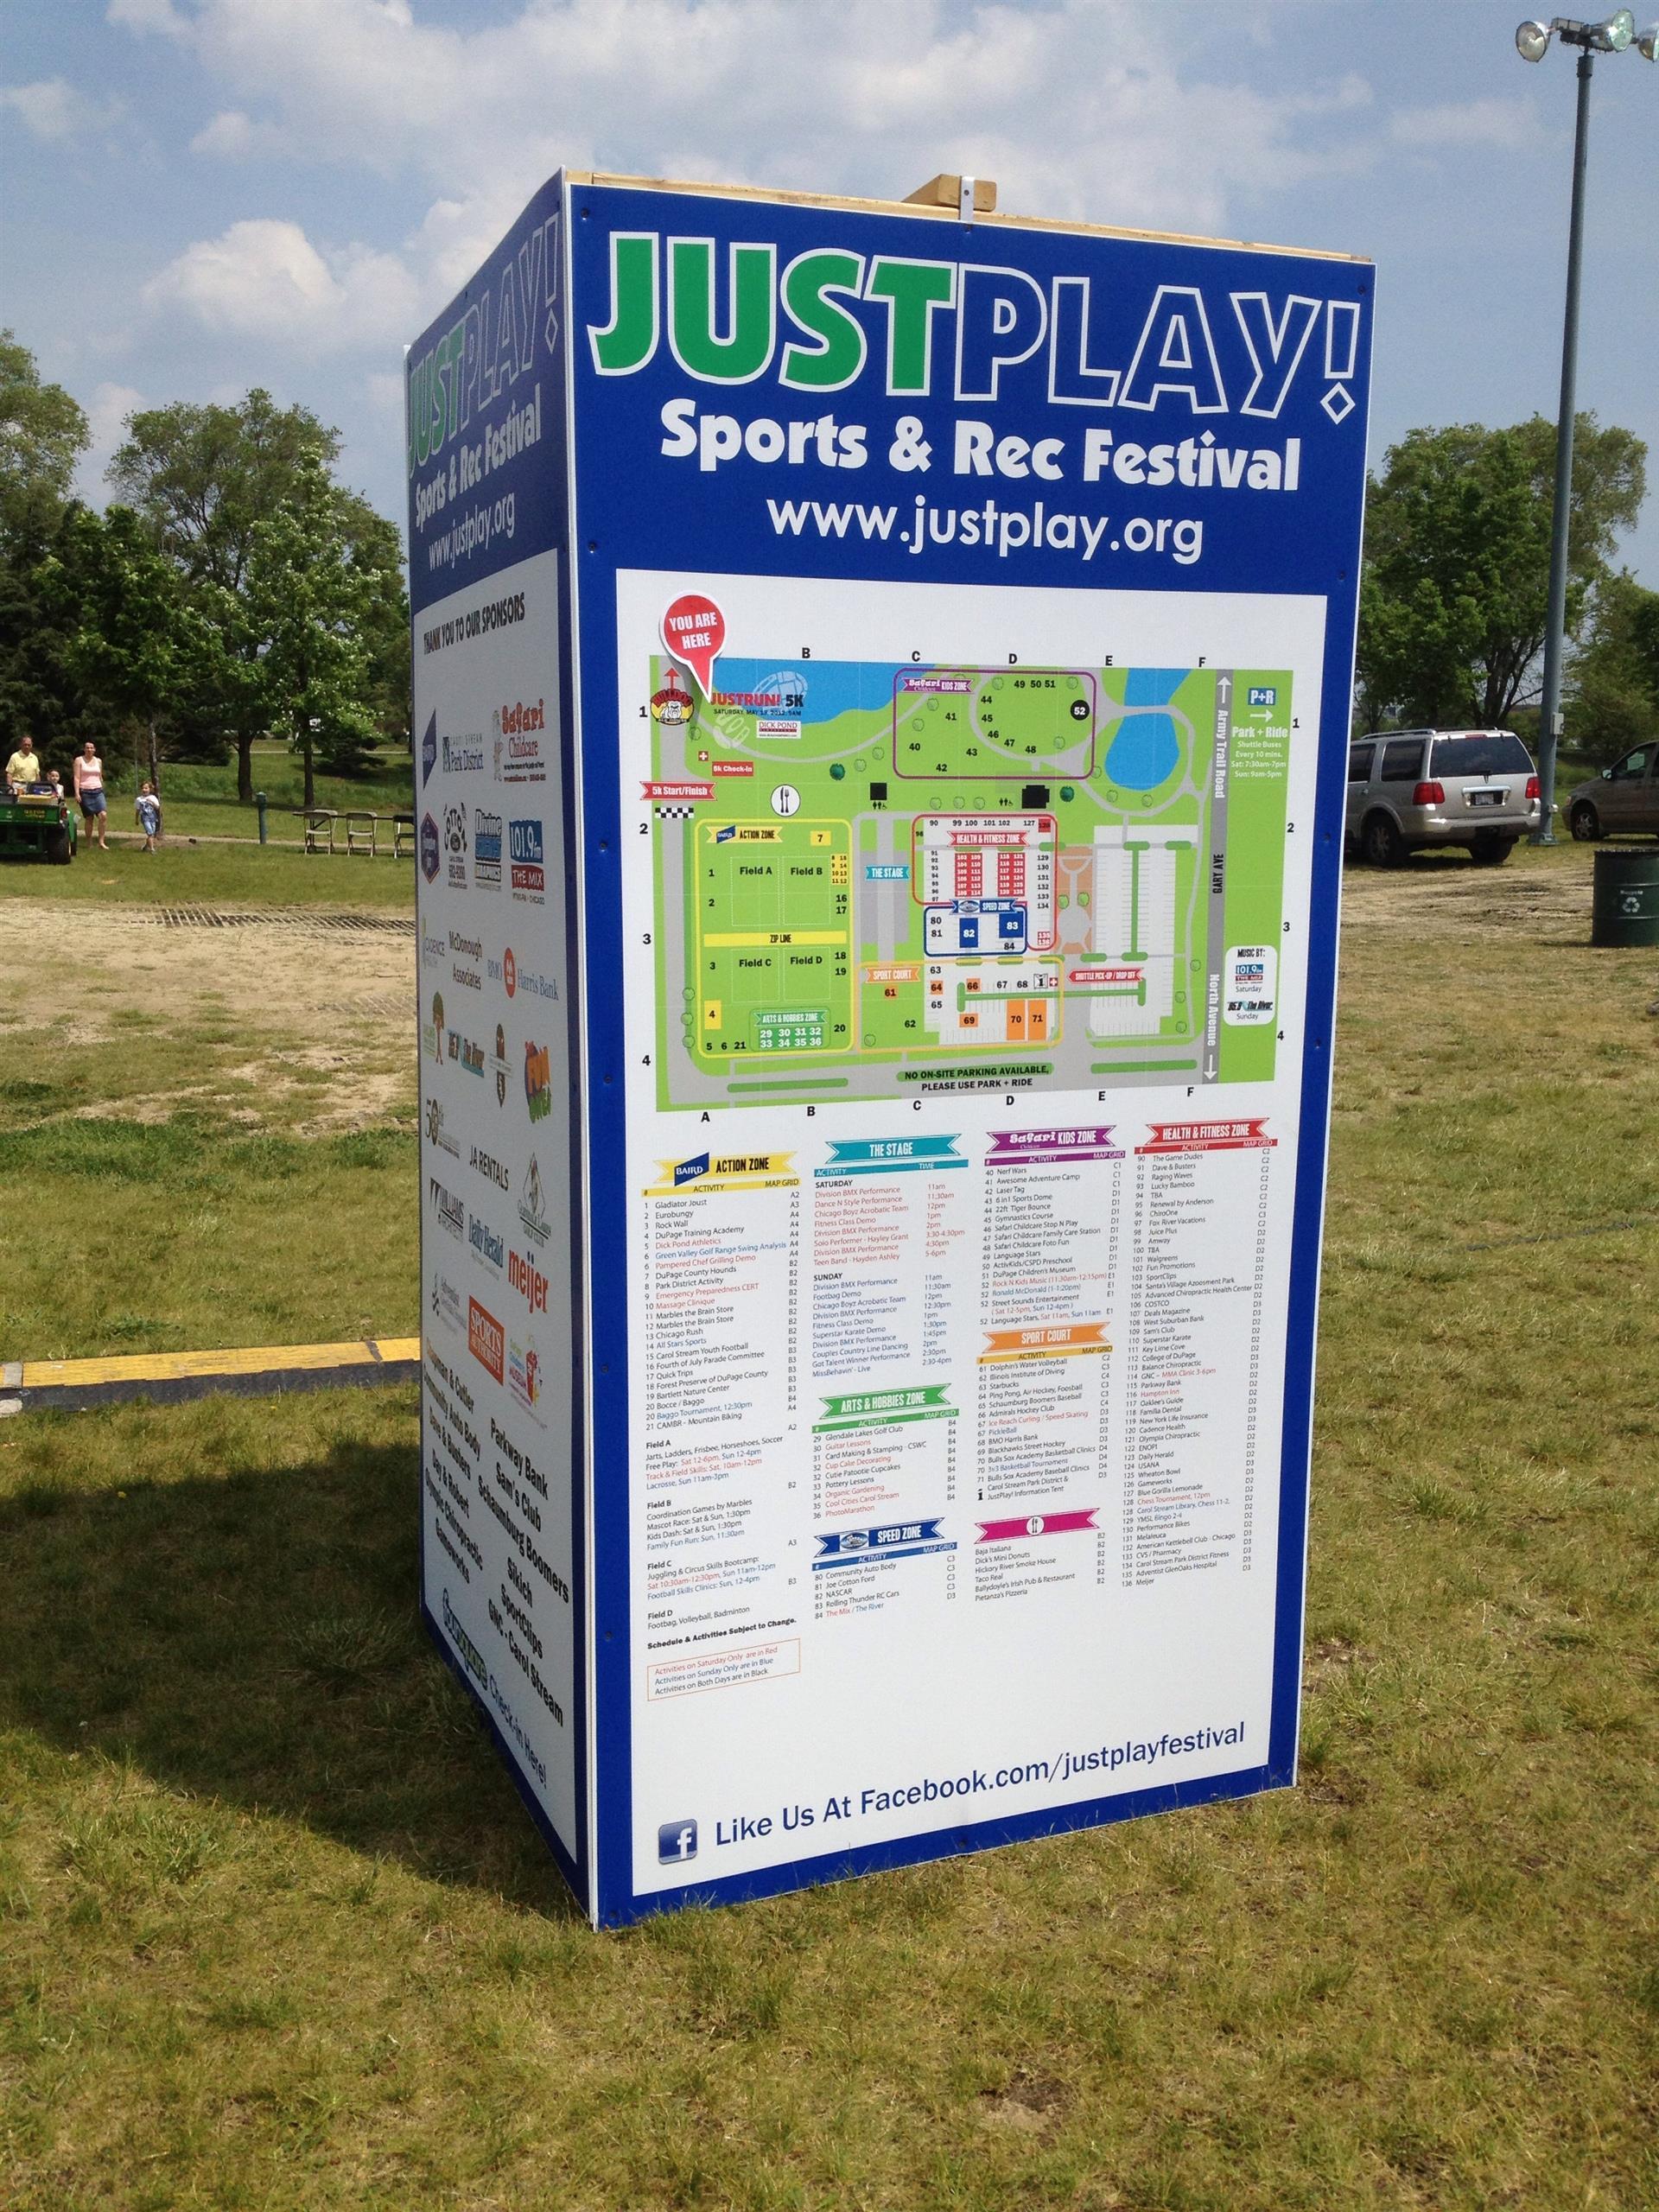 Just Play Spore & Rec Special Event Signage